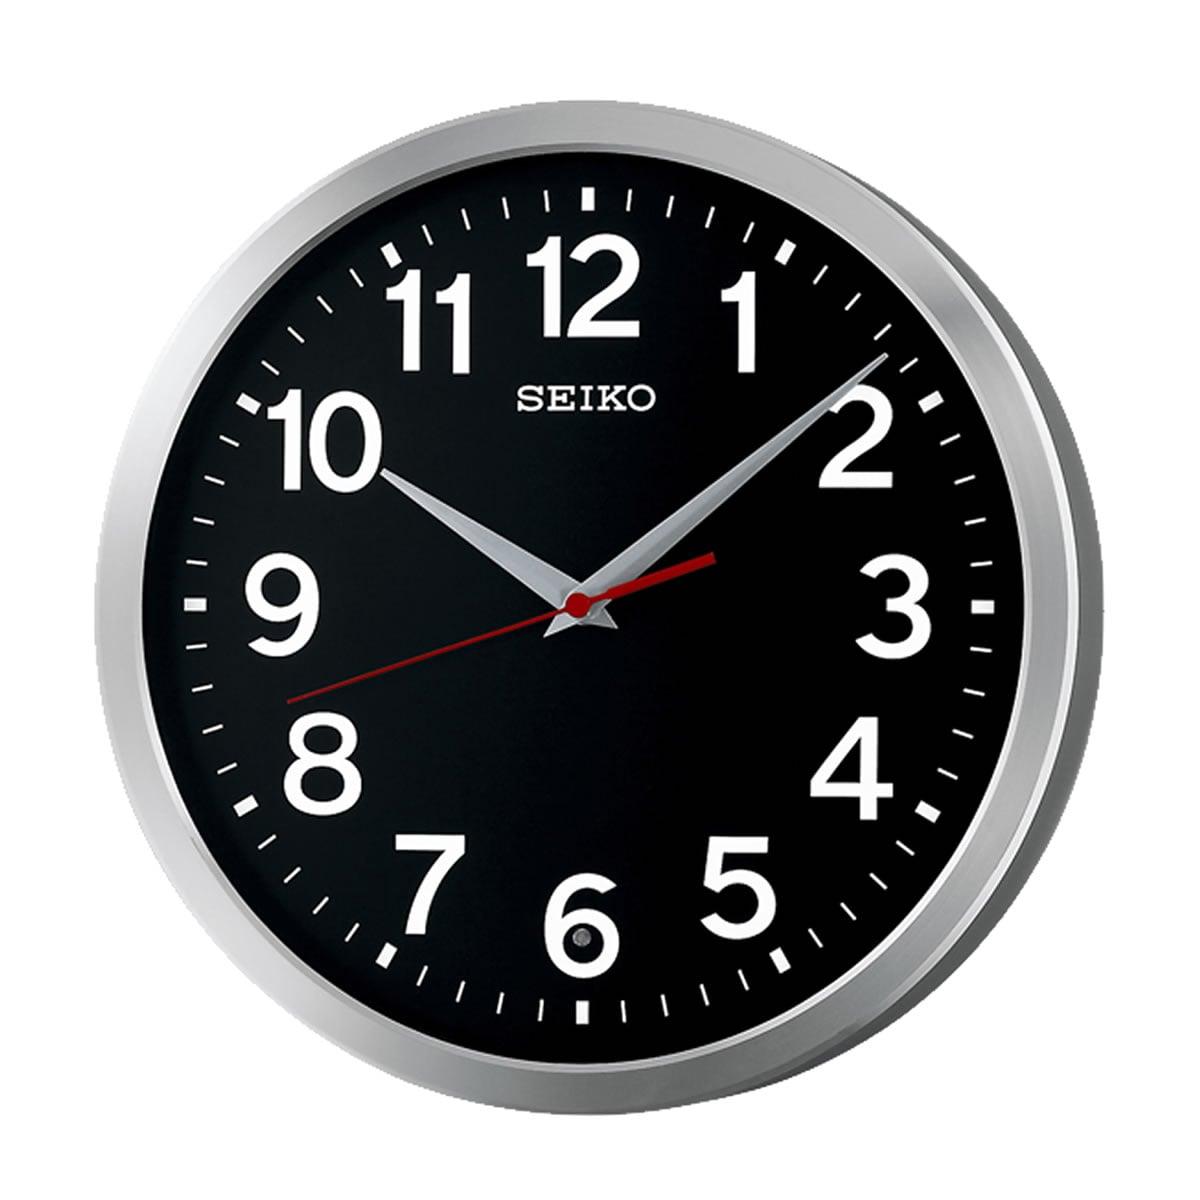 SEIKO(セイコー)オフィスタイプ 電波掛け時計 KX227K ブラック